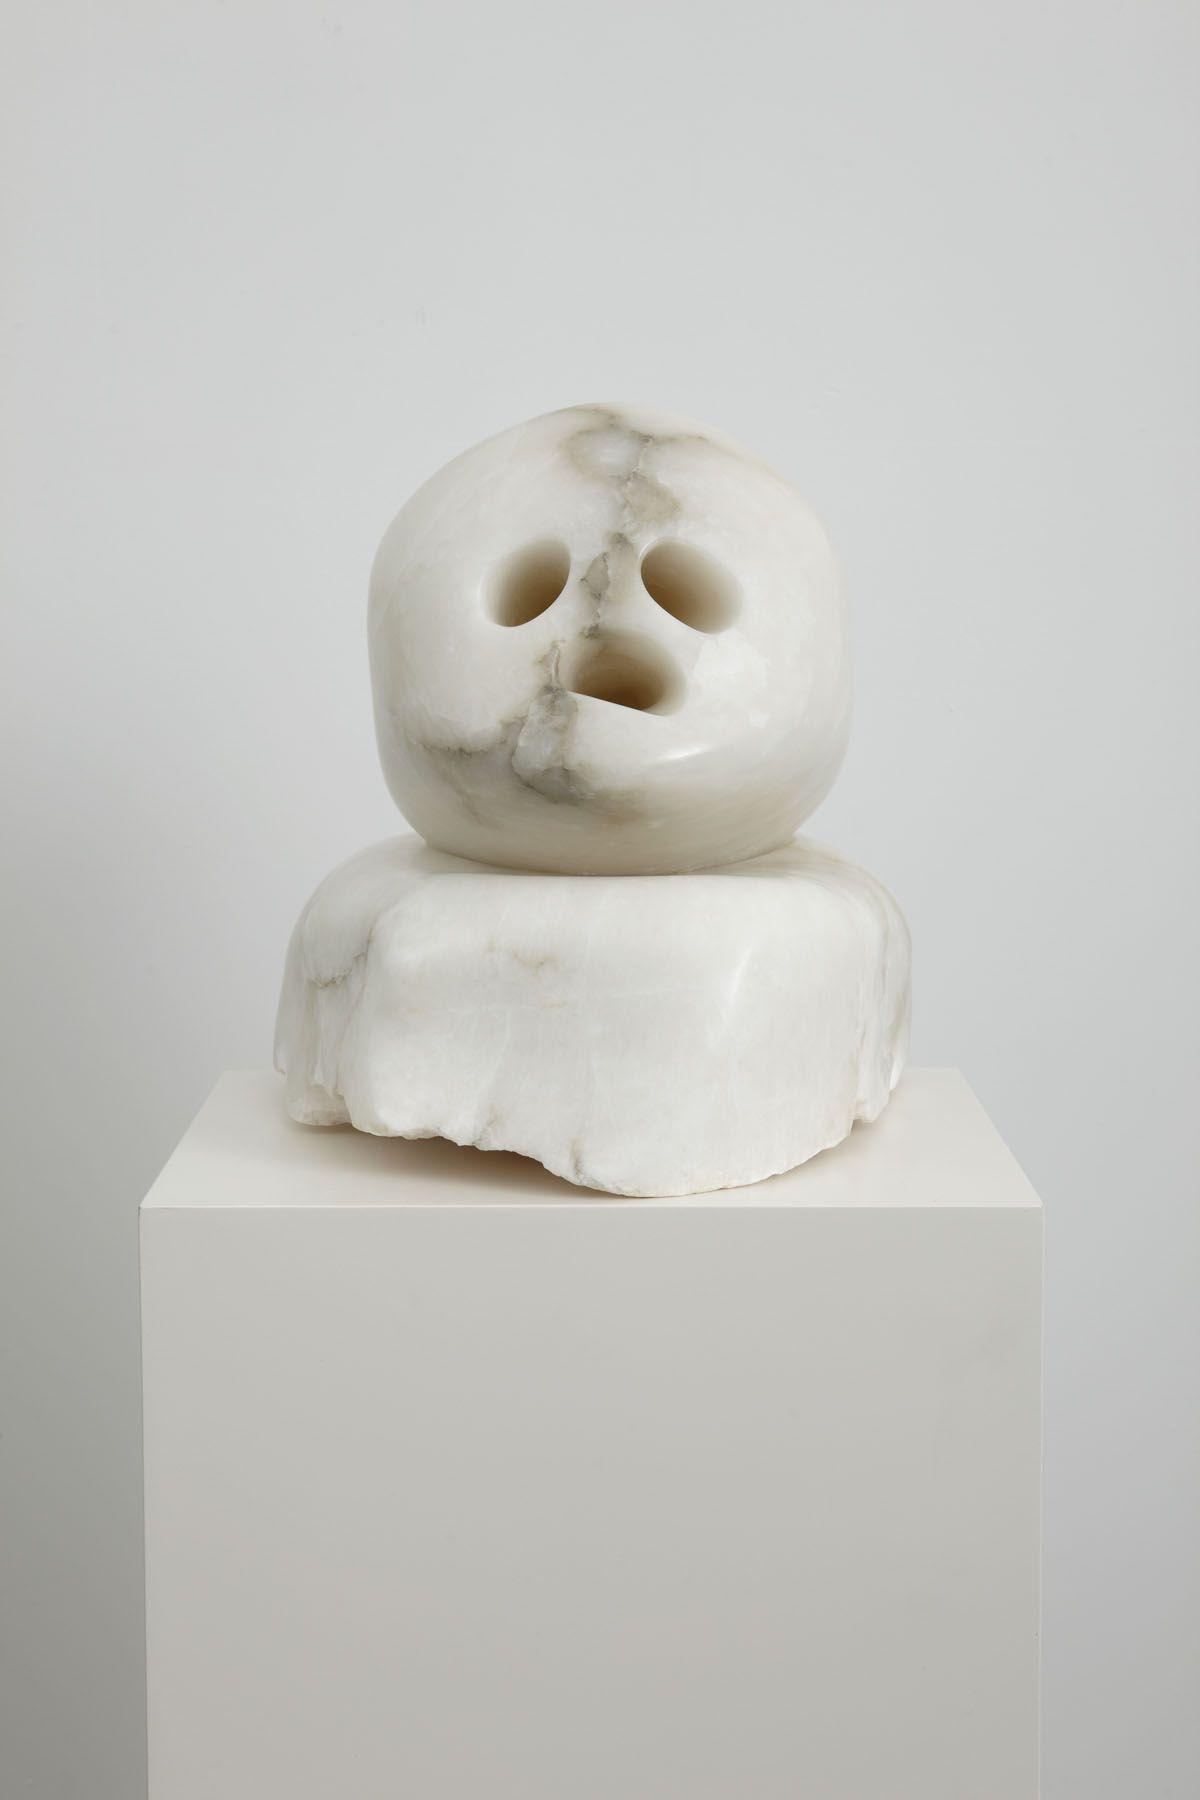 marble bust by ivette zighelboim